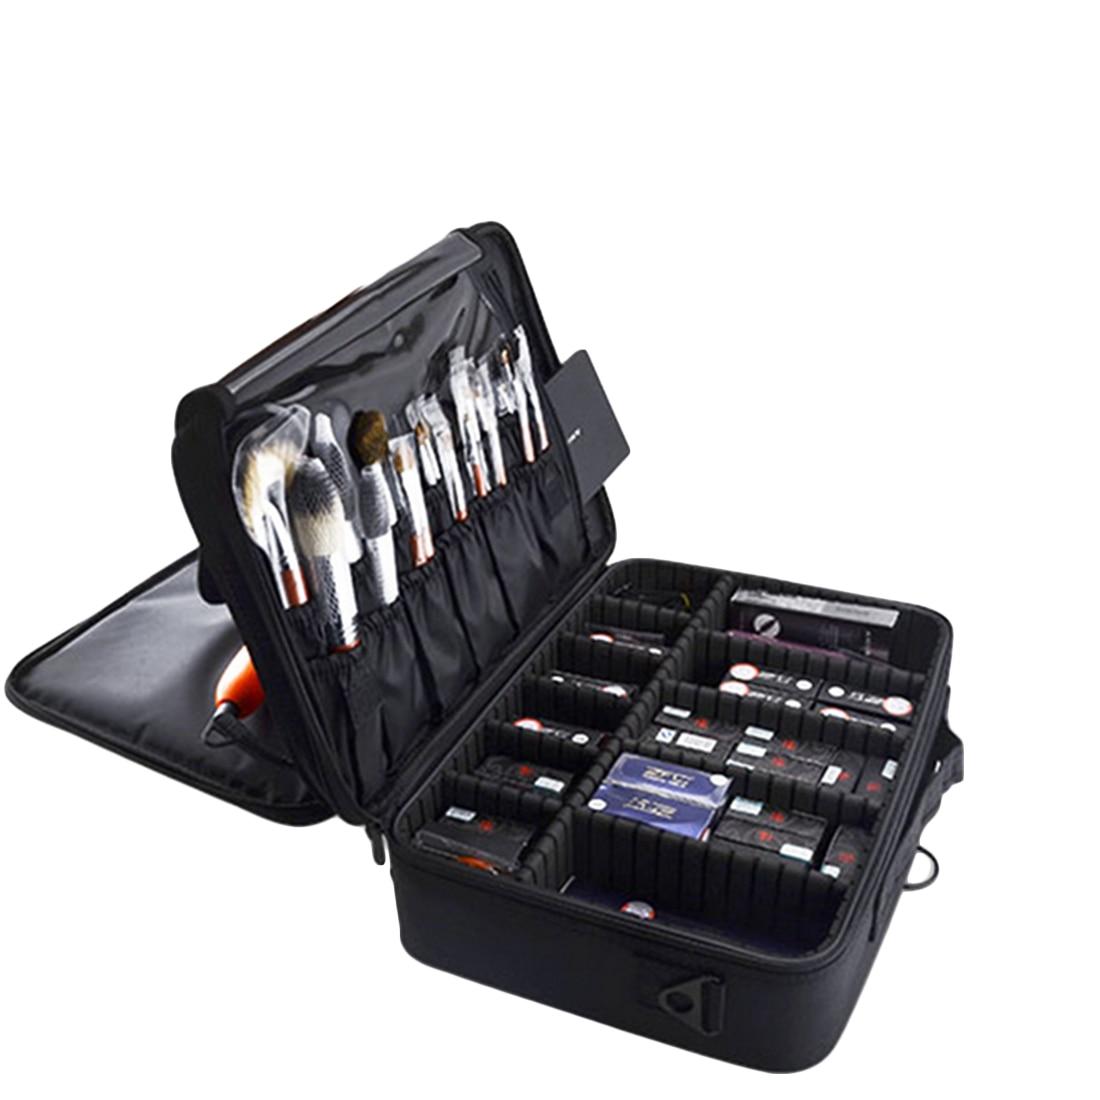 ARESLAND Portable Makeup Bag Cosmetic Cases Case For Women Cosmetics Box Lagre Makeup Make Up Bag Black